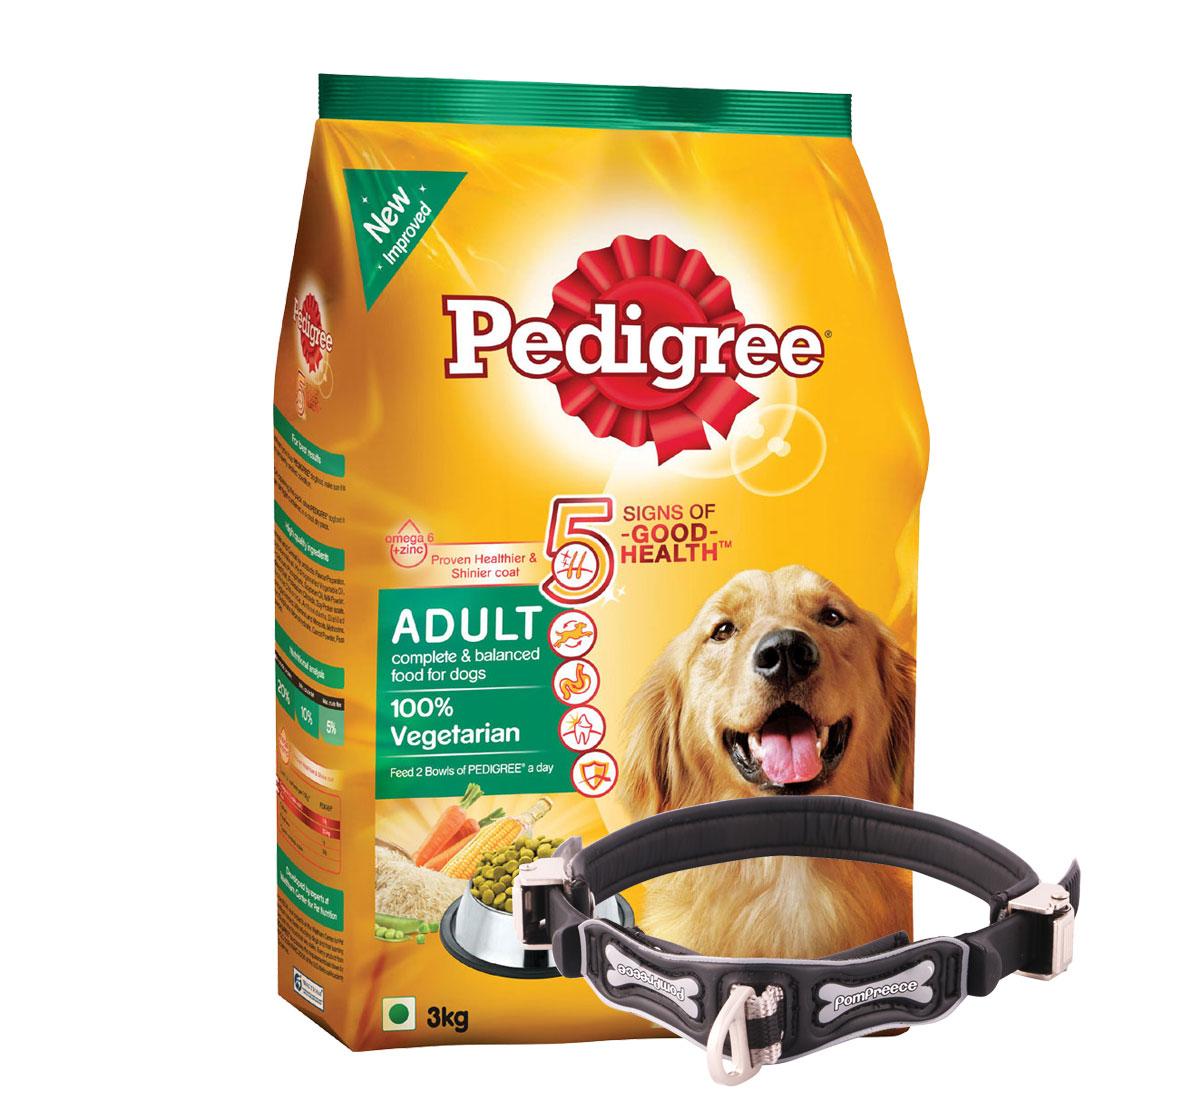 Pedigree Dog Food Adult 100% Vegetarian - 3 Kg With Ergocomfort Dog Collar Large-Black